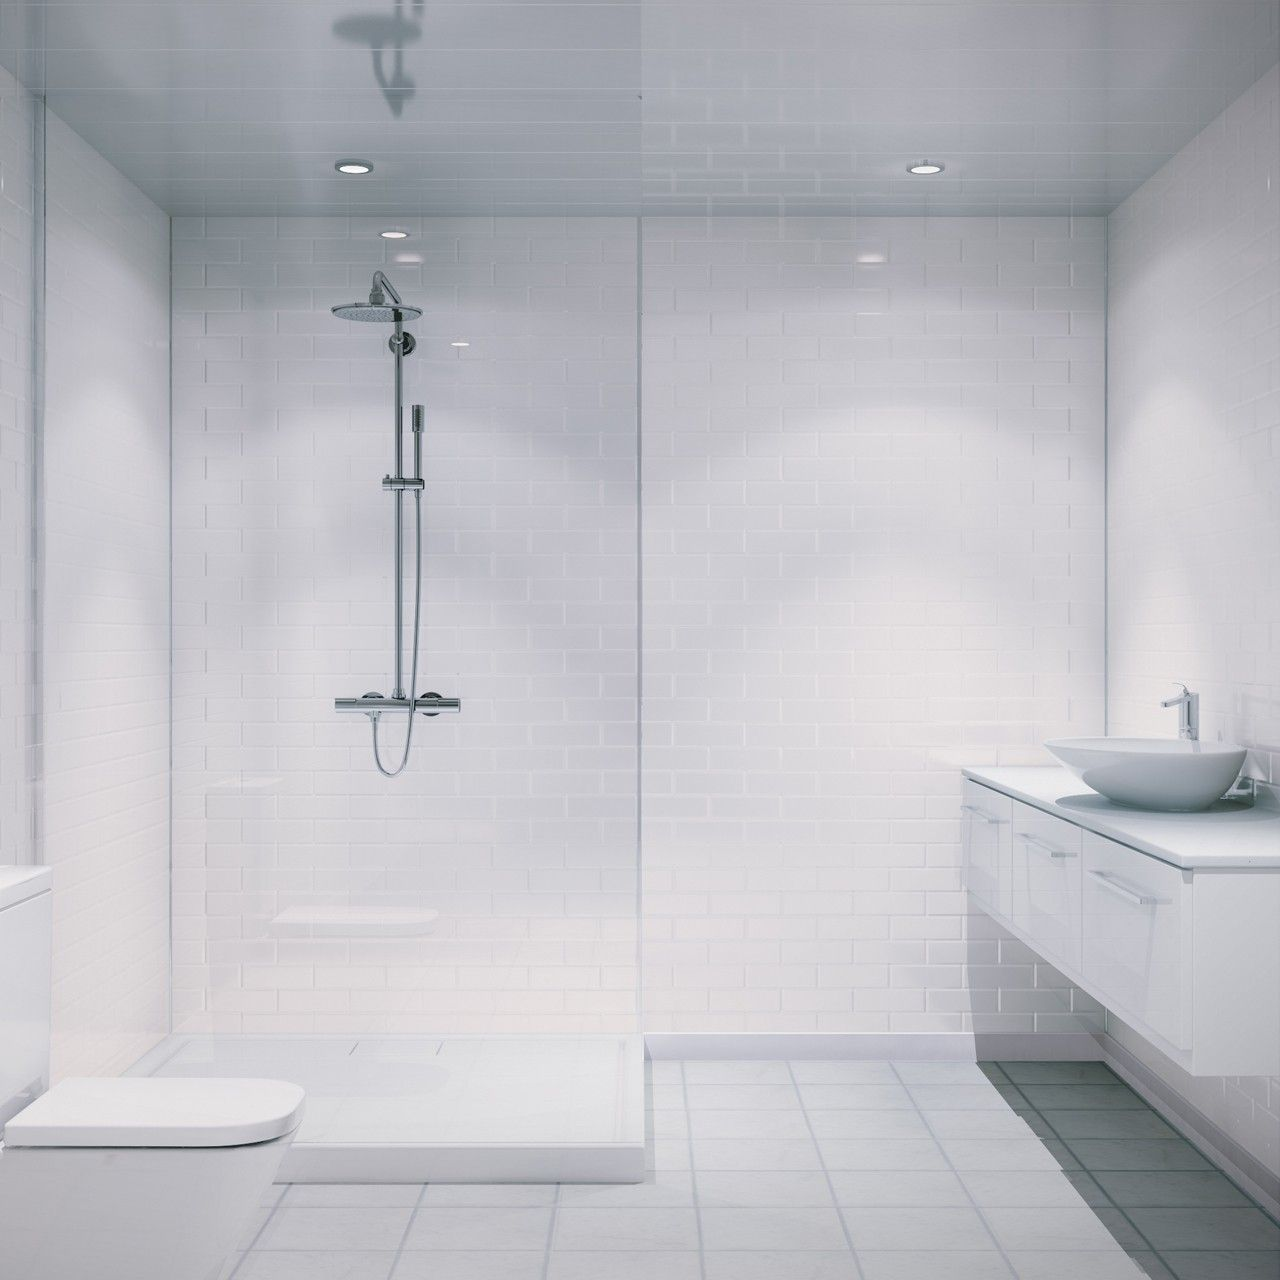 Multipanel White Vertical Brick Tile 2440mm X 1220mm Bathroom Wall Panel Bathroom Wall Panels Shower Panels Shower Wall Panels